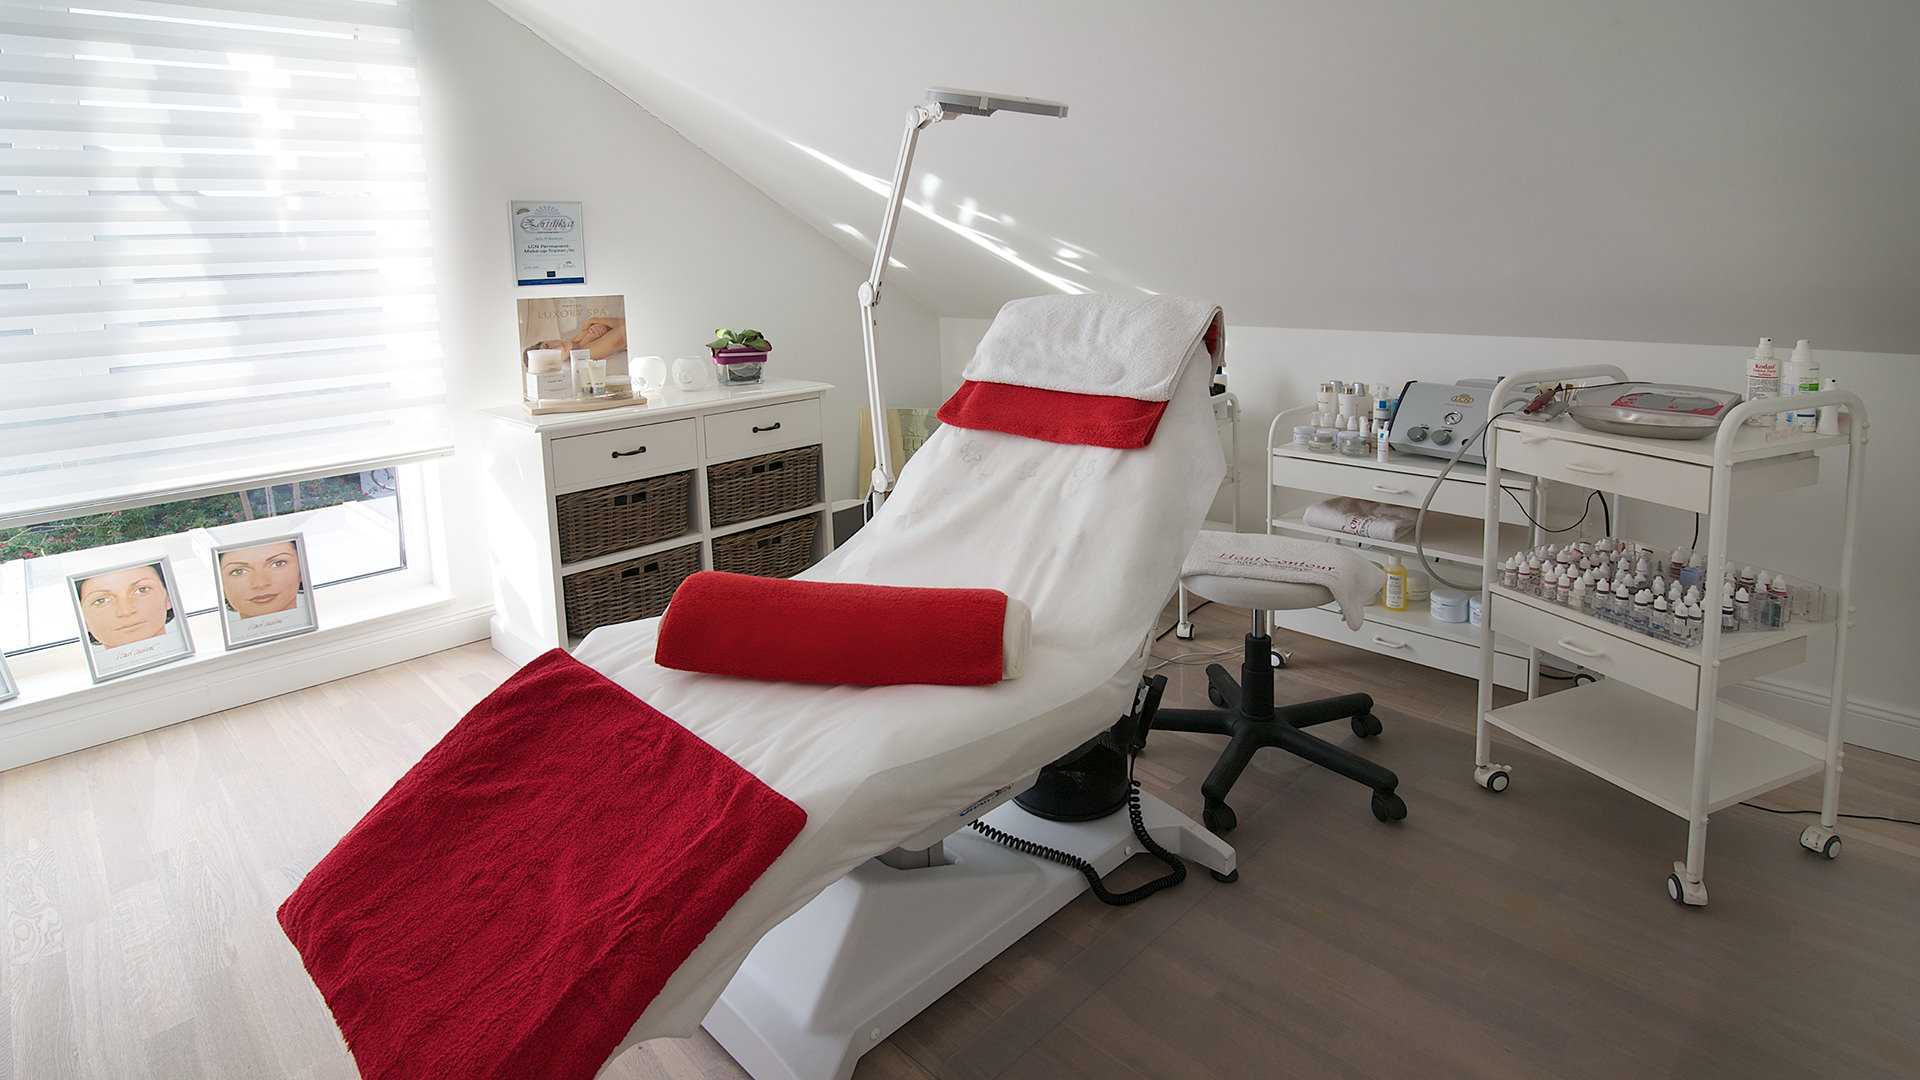 jutta wilkemeyer permanent make up und kosmetik m nster. Black Bedroom Furniture Sets. Home Design Ideas